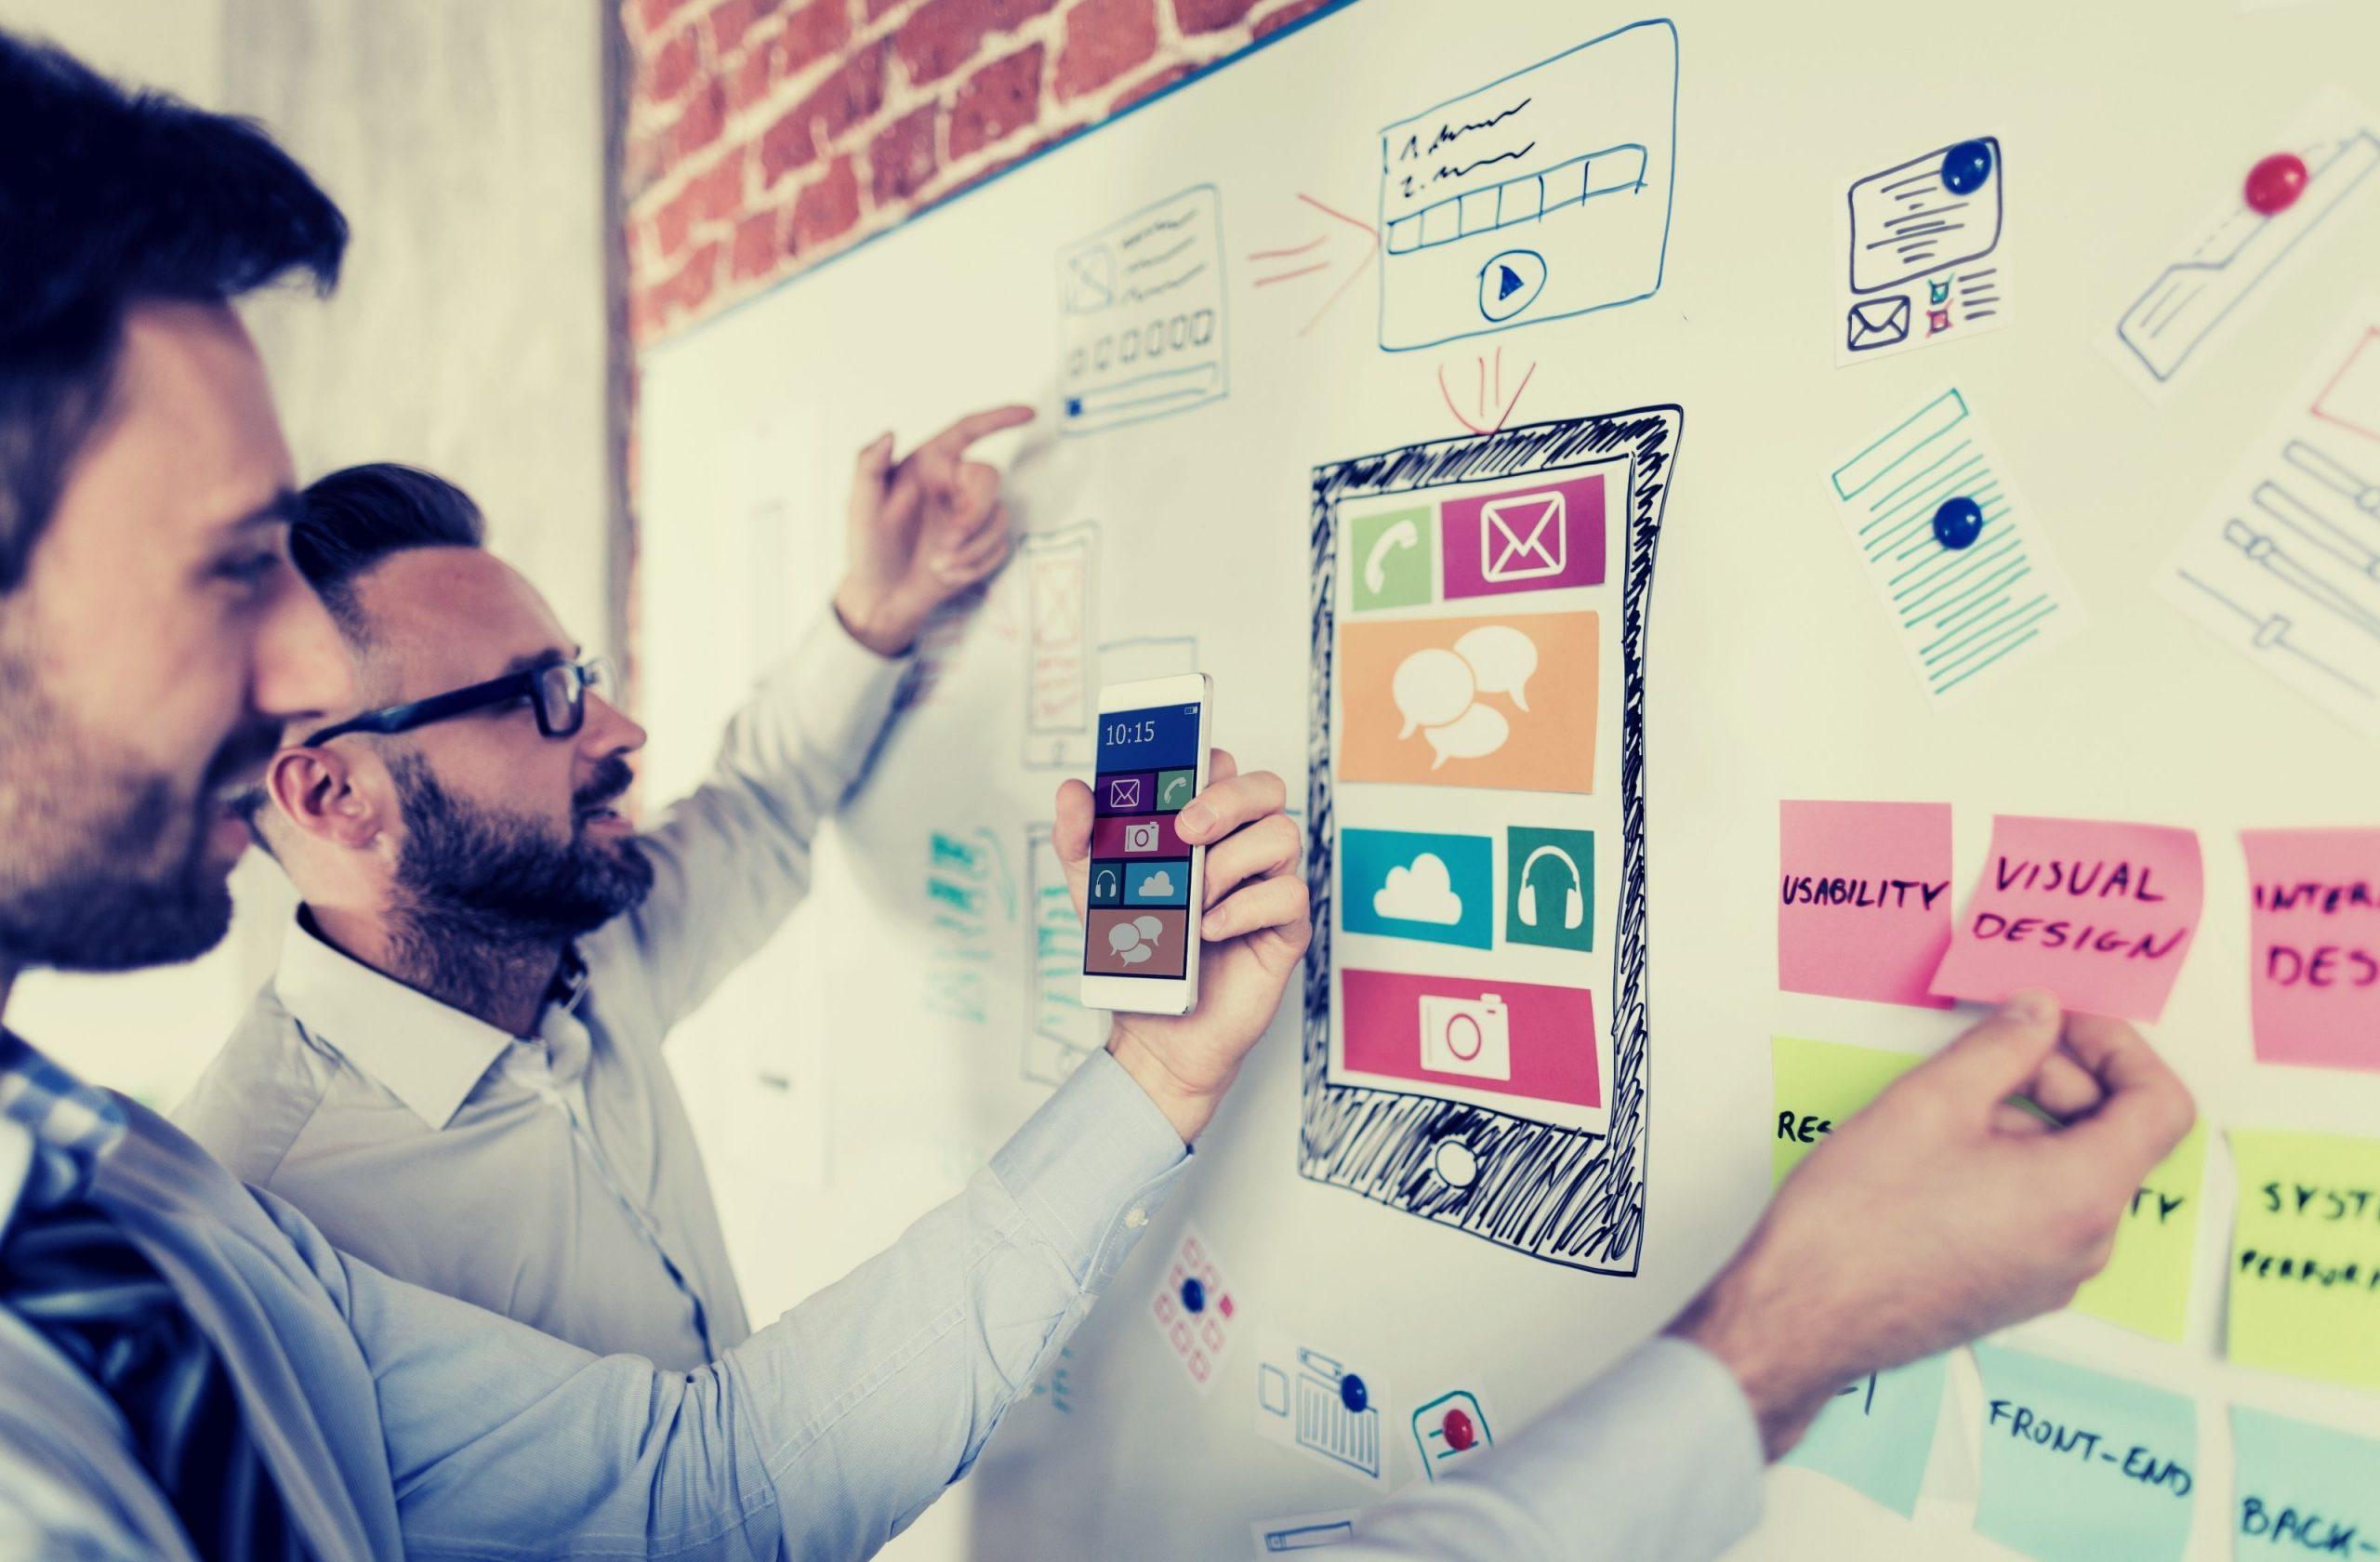 Web Design Tampa & SEO Agency Conversion Focused